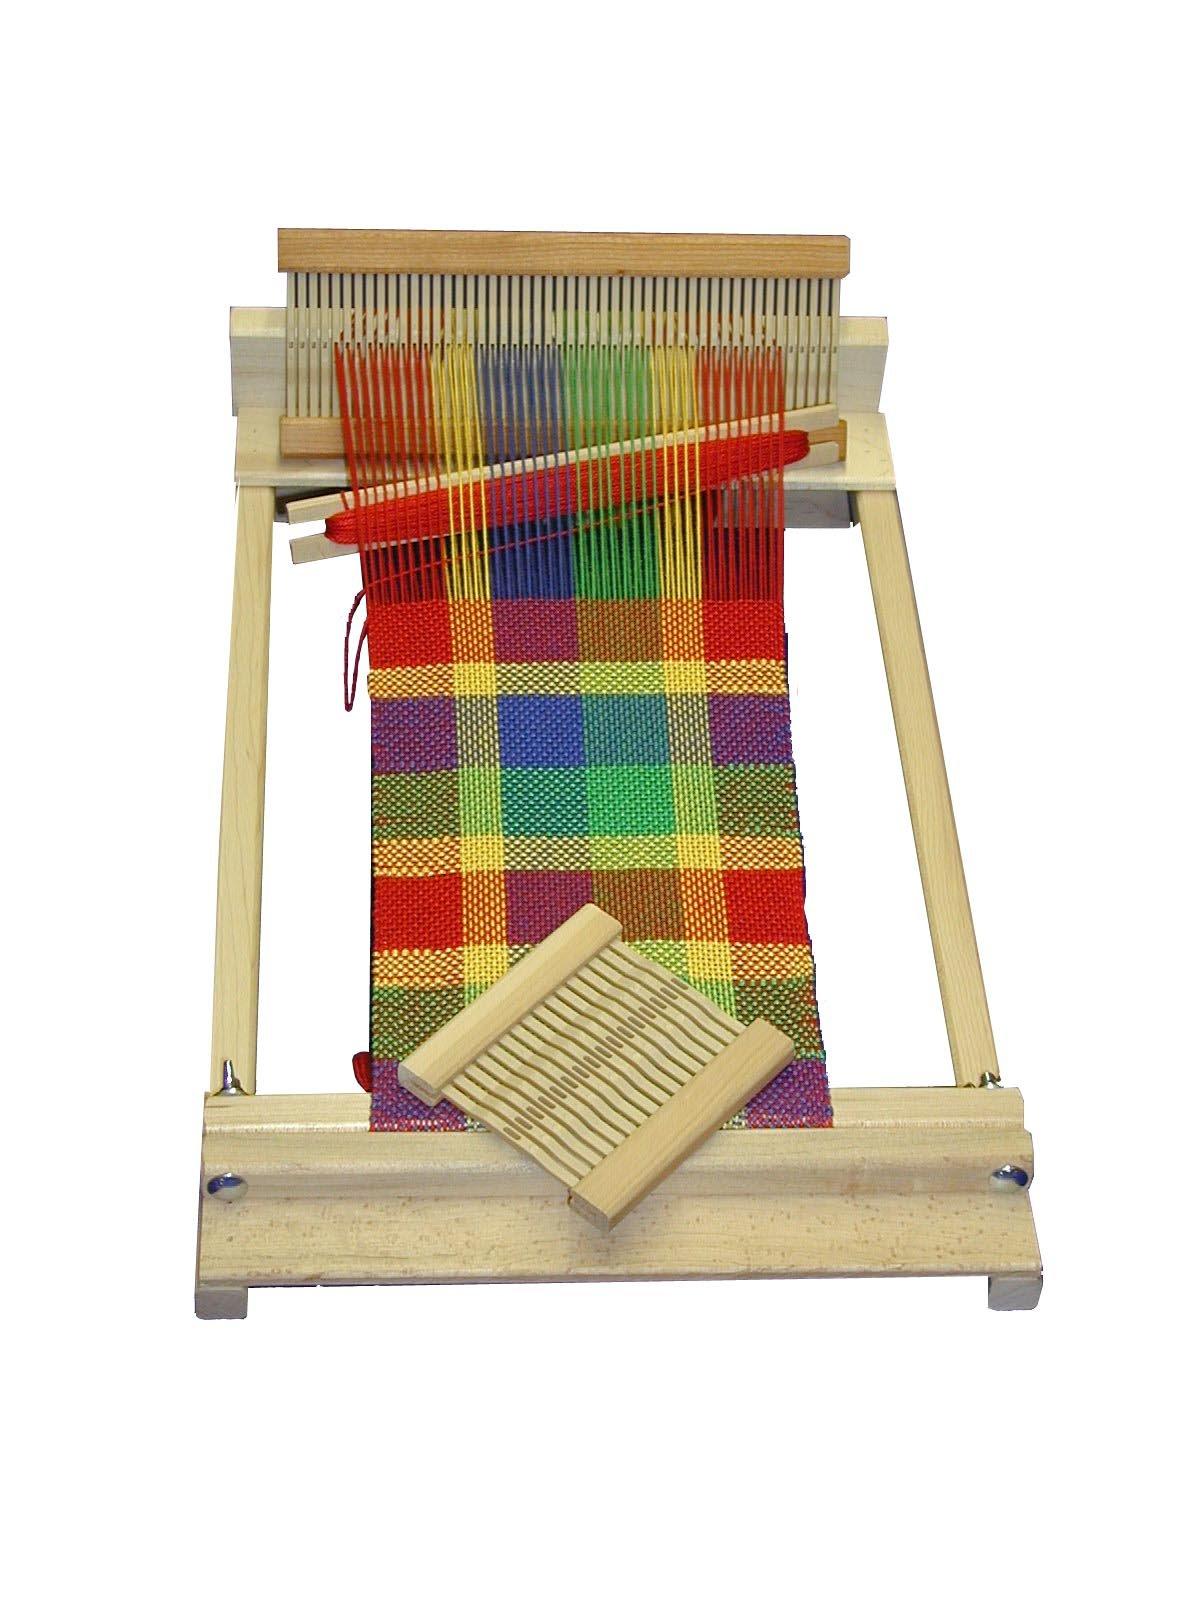 Beka Rigid Heddle Childs Loom 10'' by Beka Inc. TOY